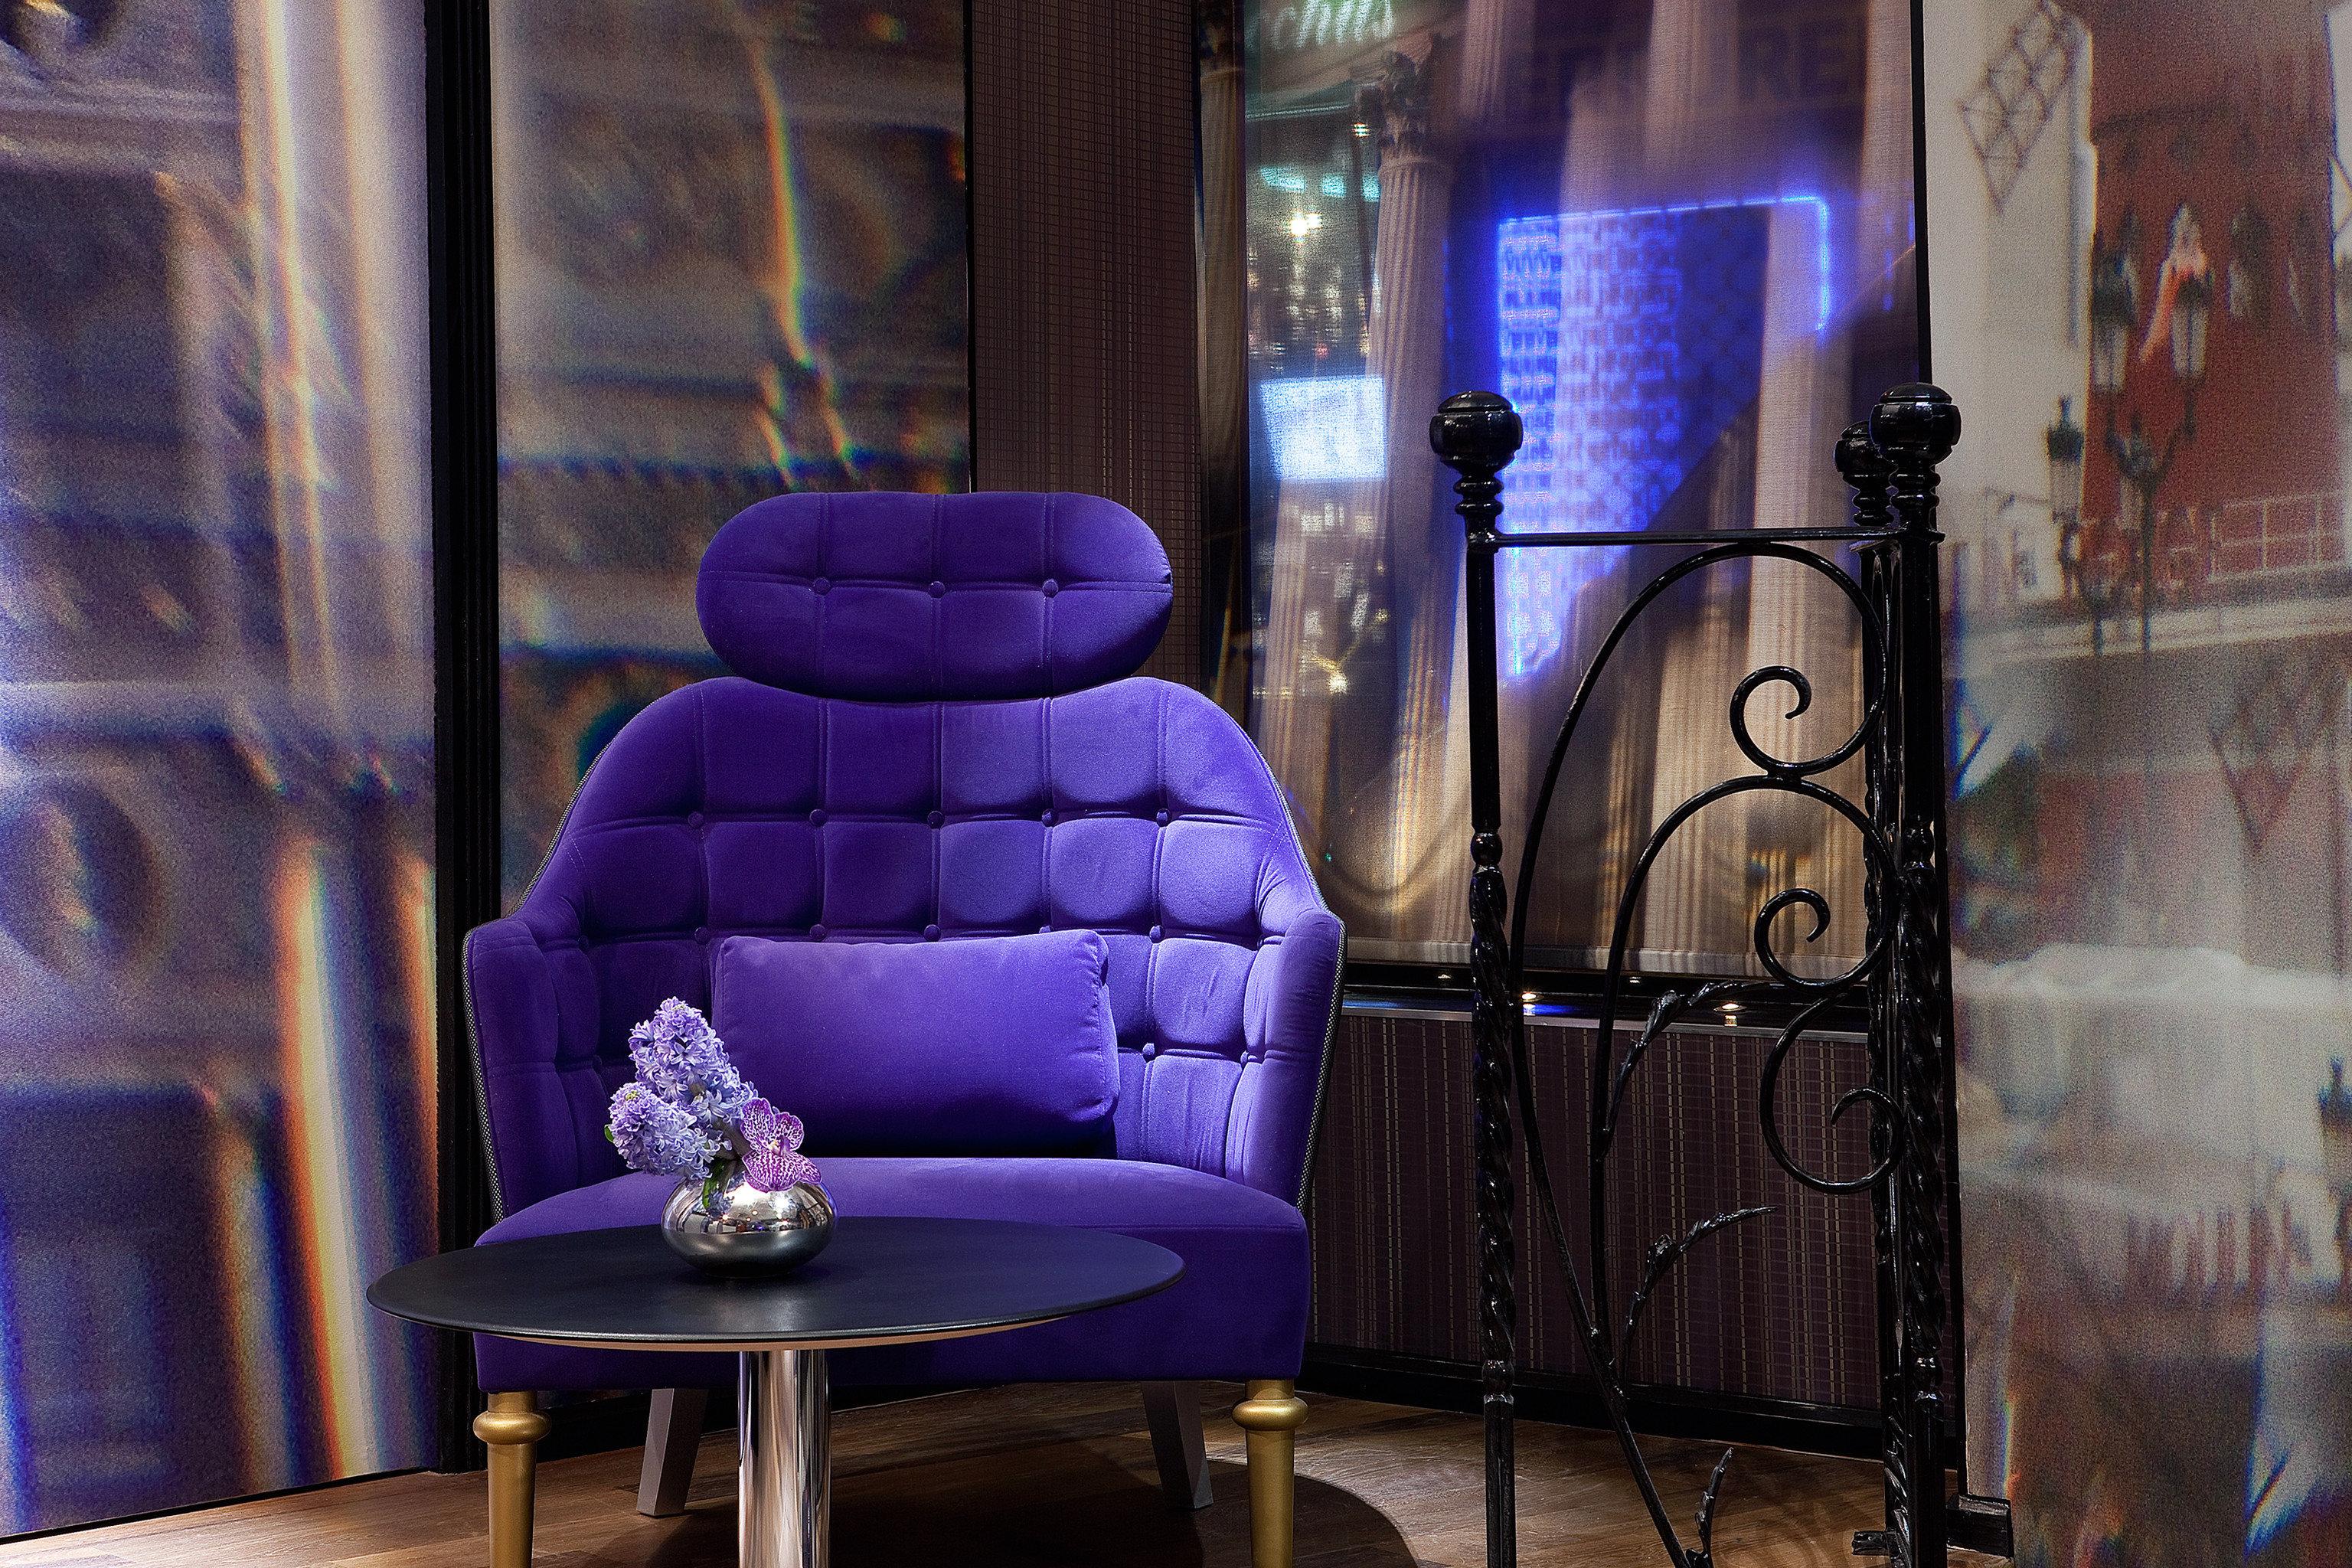 Grounds Hip Nightlife Play Romance Romantic color blue purple lighting screenshot display window living room chair theatre